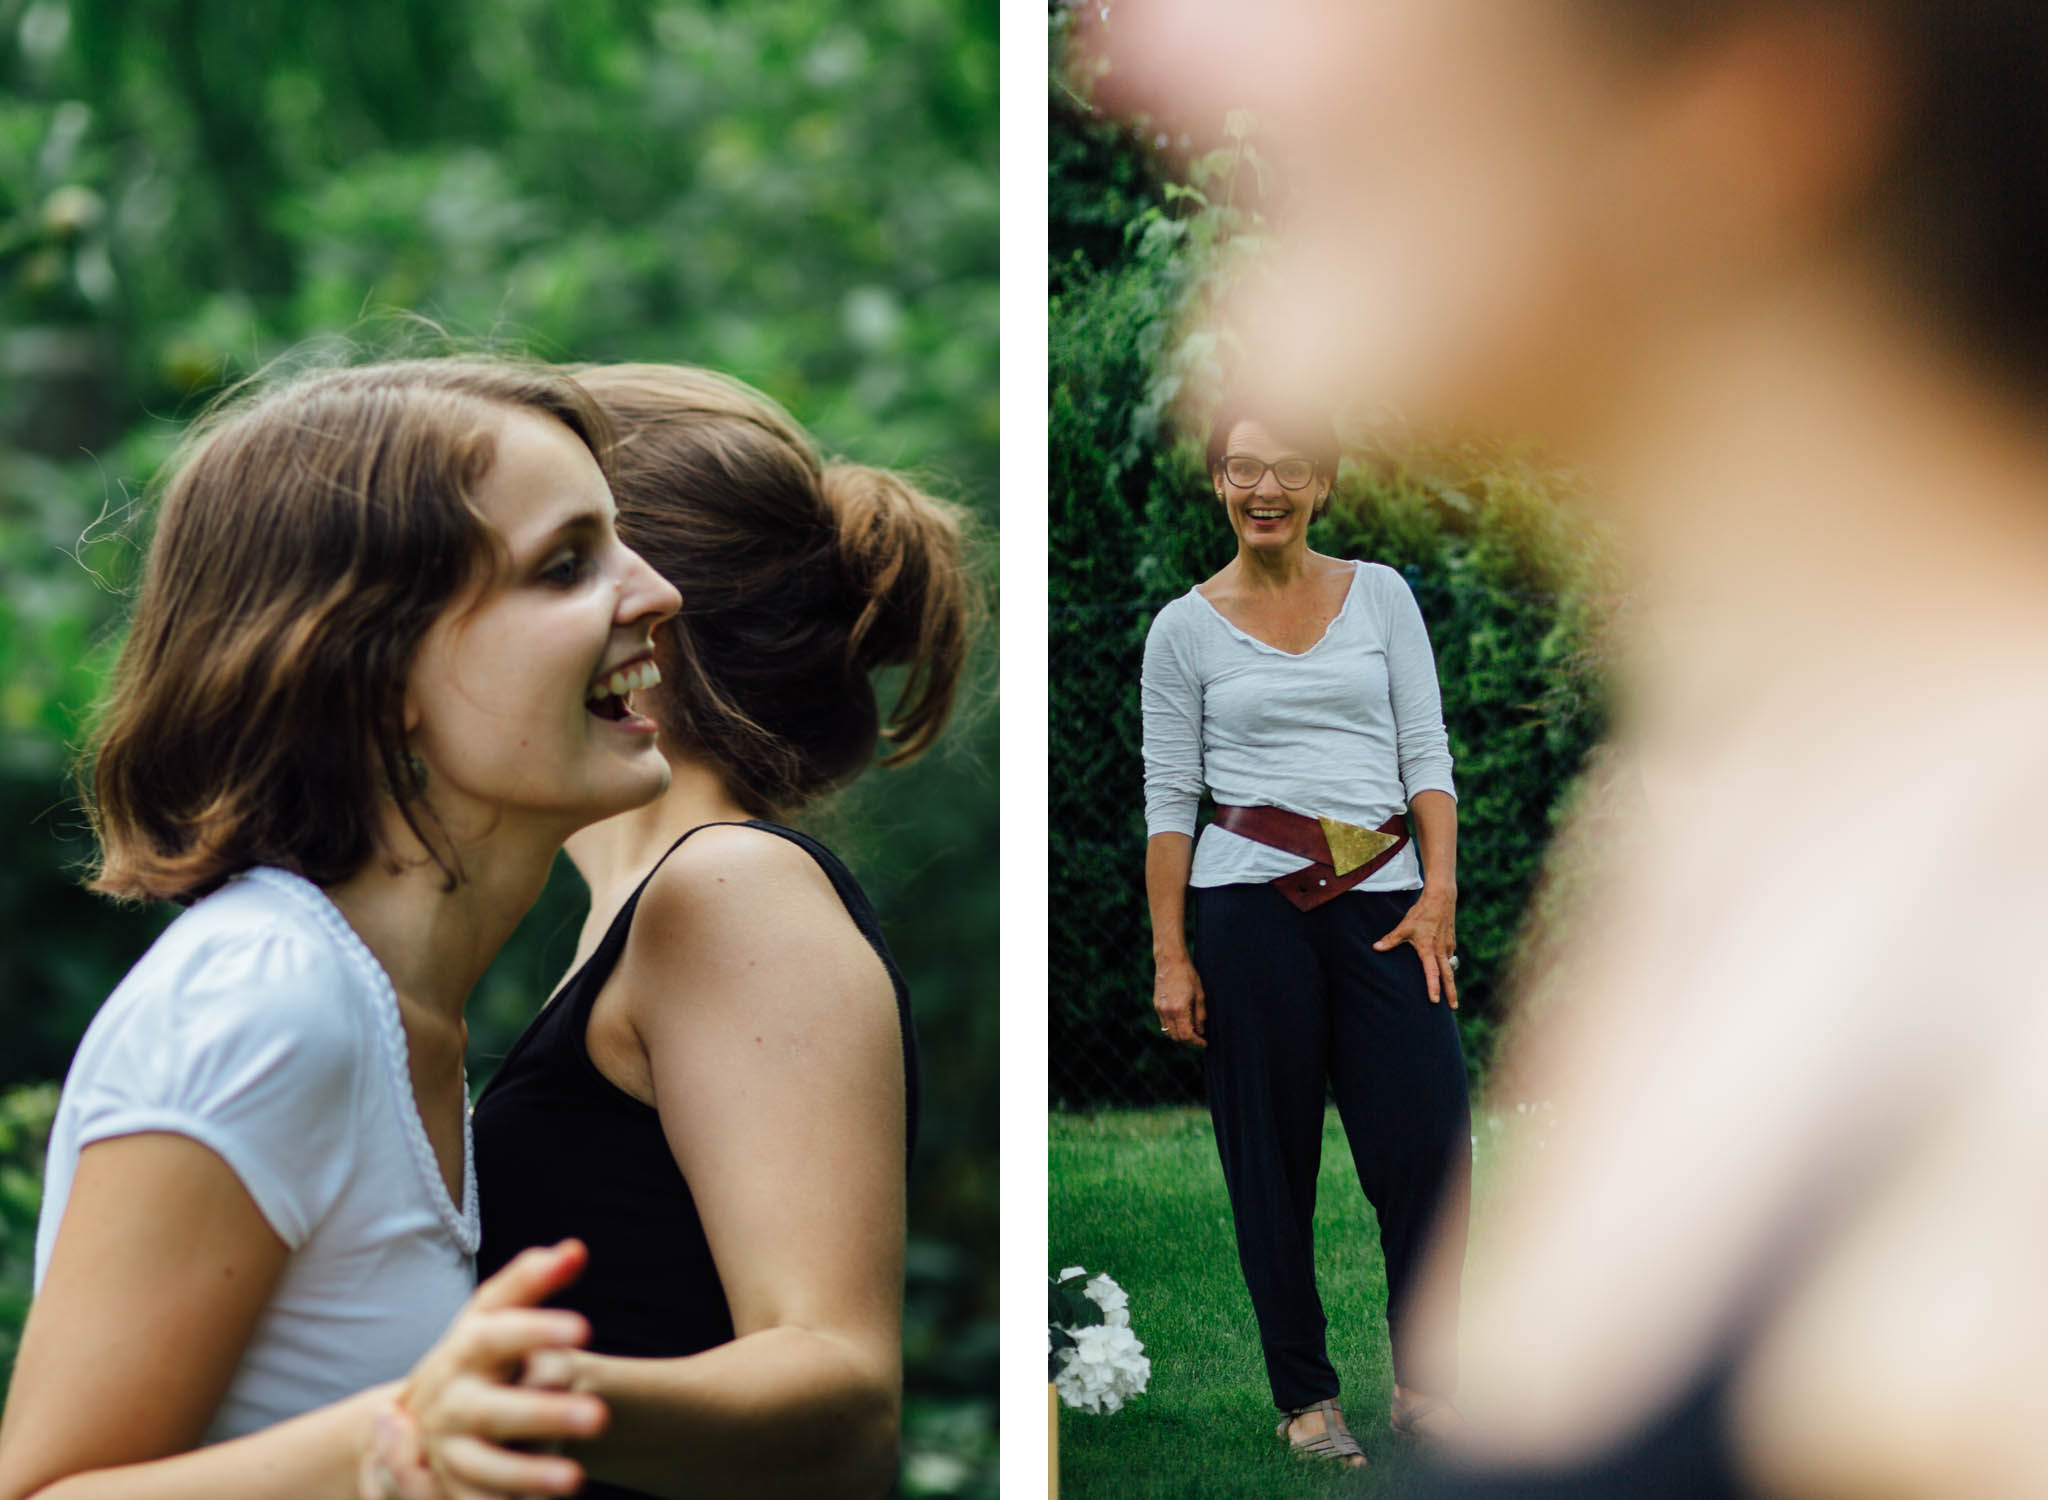 familienfotos-reportage-berlin-homestory